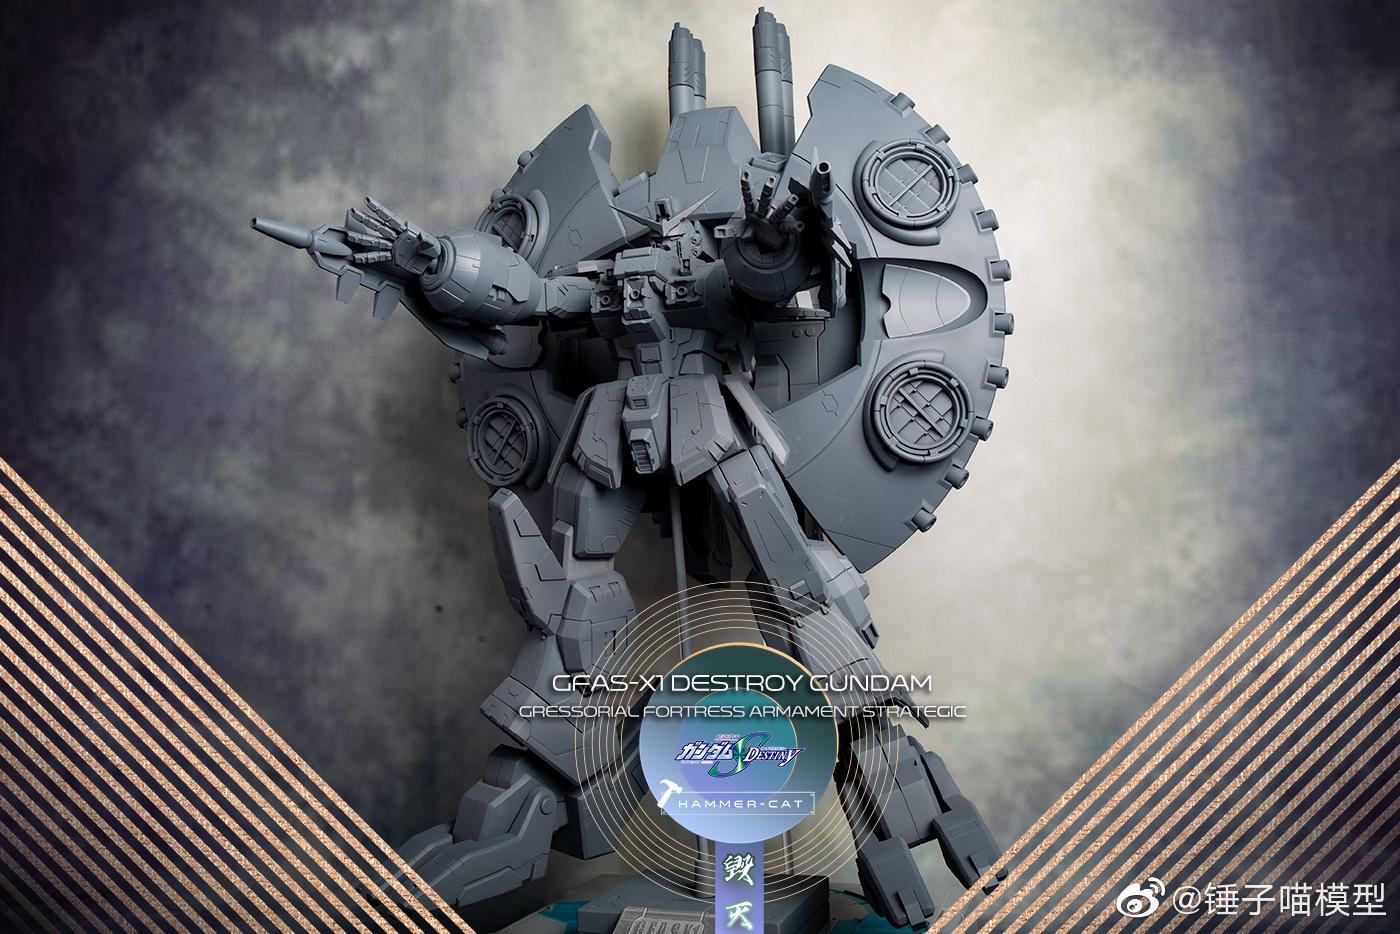 G744_GFAS_X1_Destroy_Gundam_004.jpg